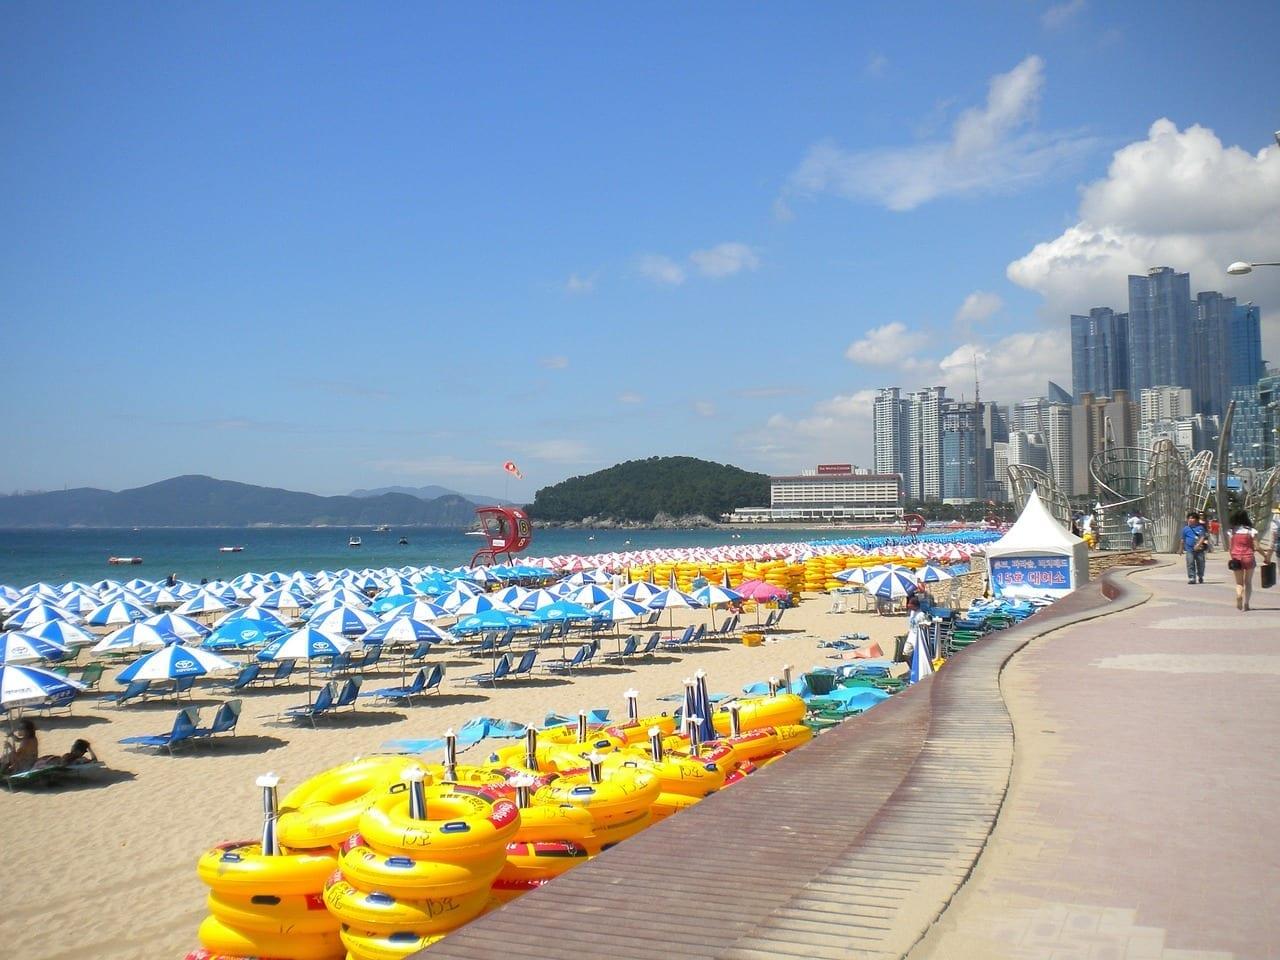 Busan Playa Haeundae Paraguas Corea del Sur